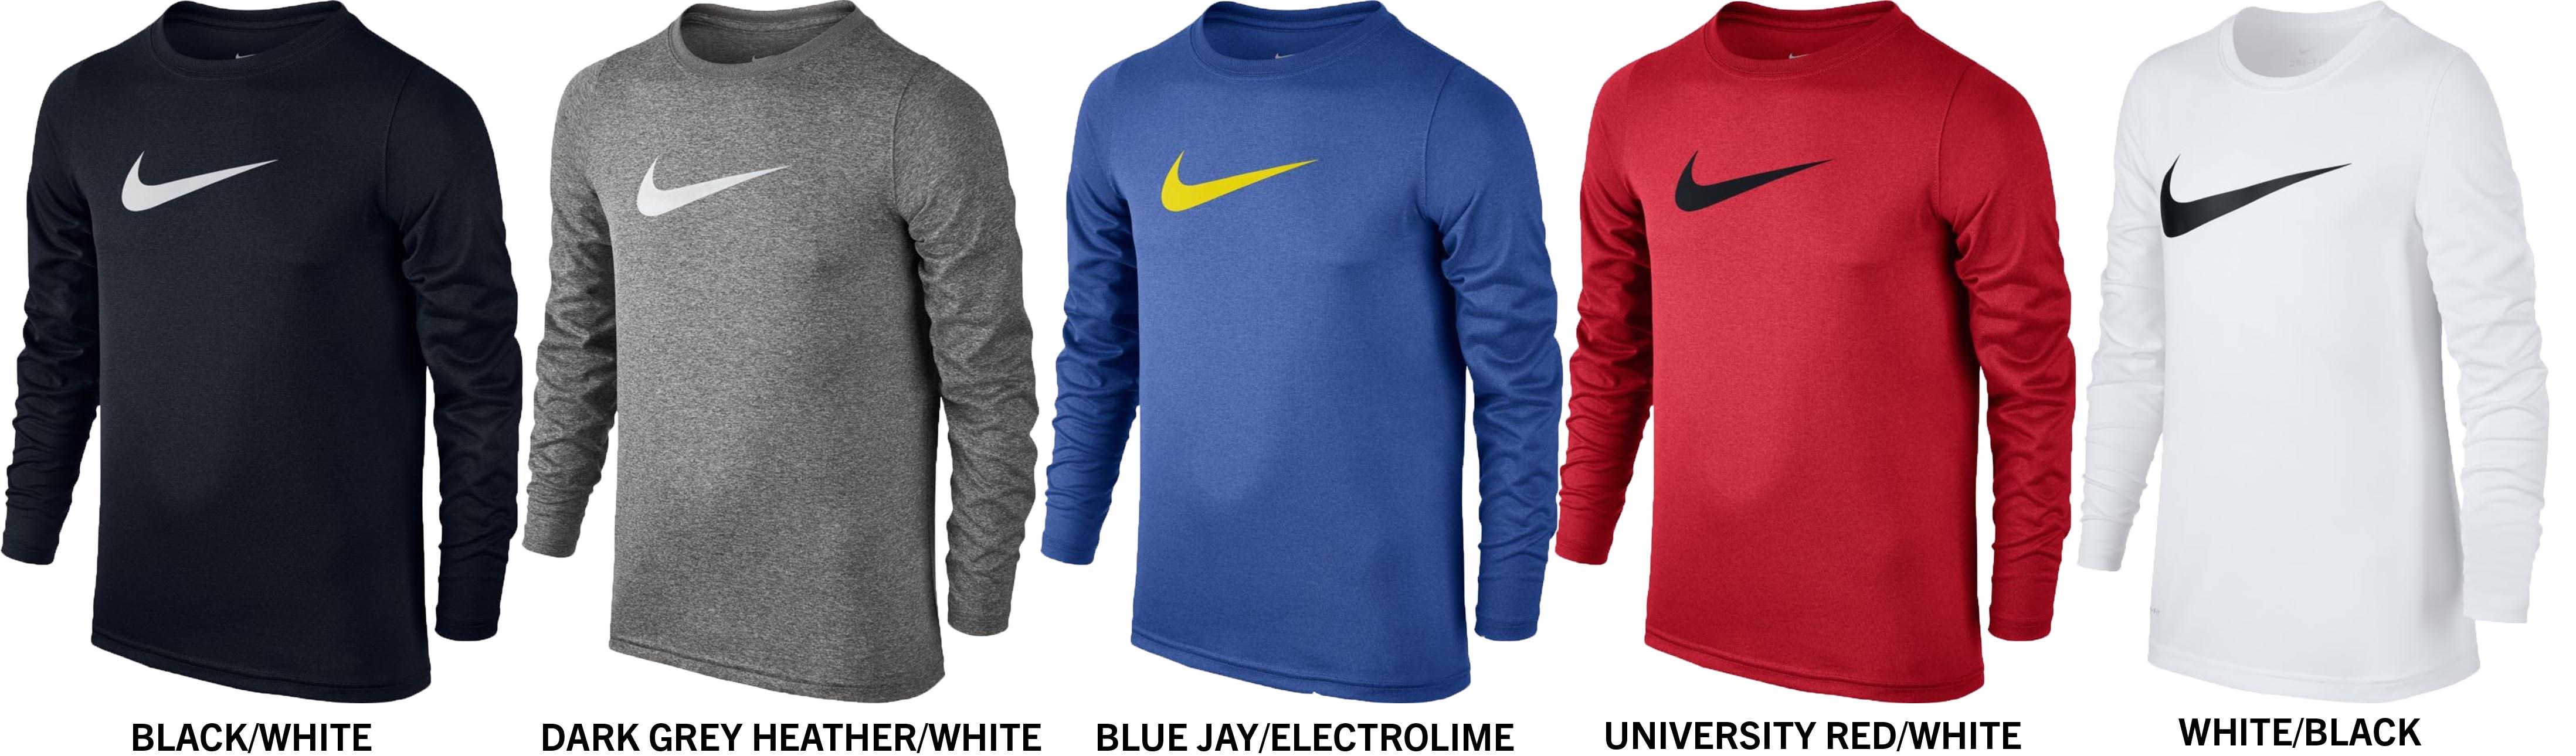 e6aab9b91a Nike Dri Fit Boy S Baseball Training T Shirt